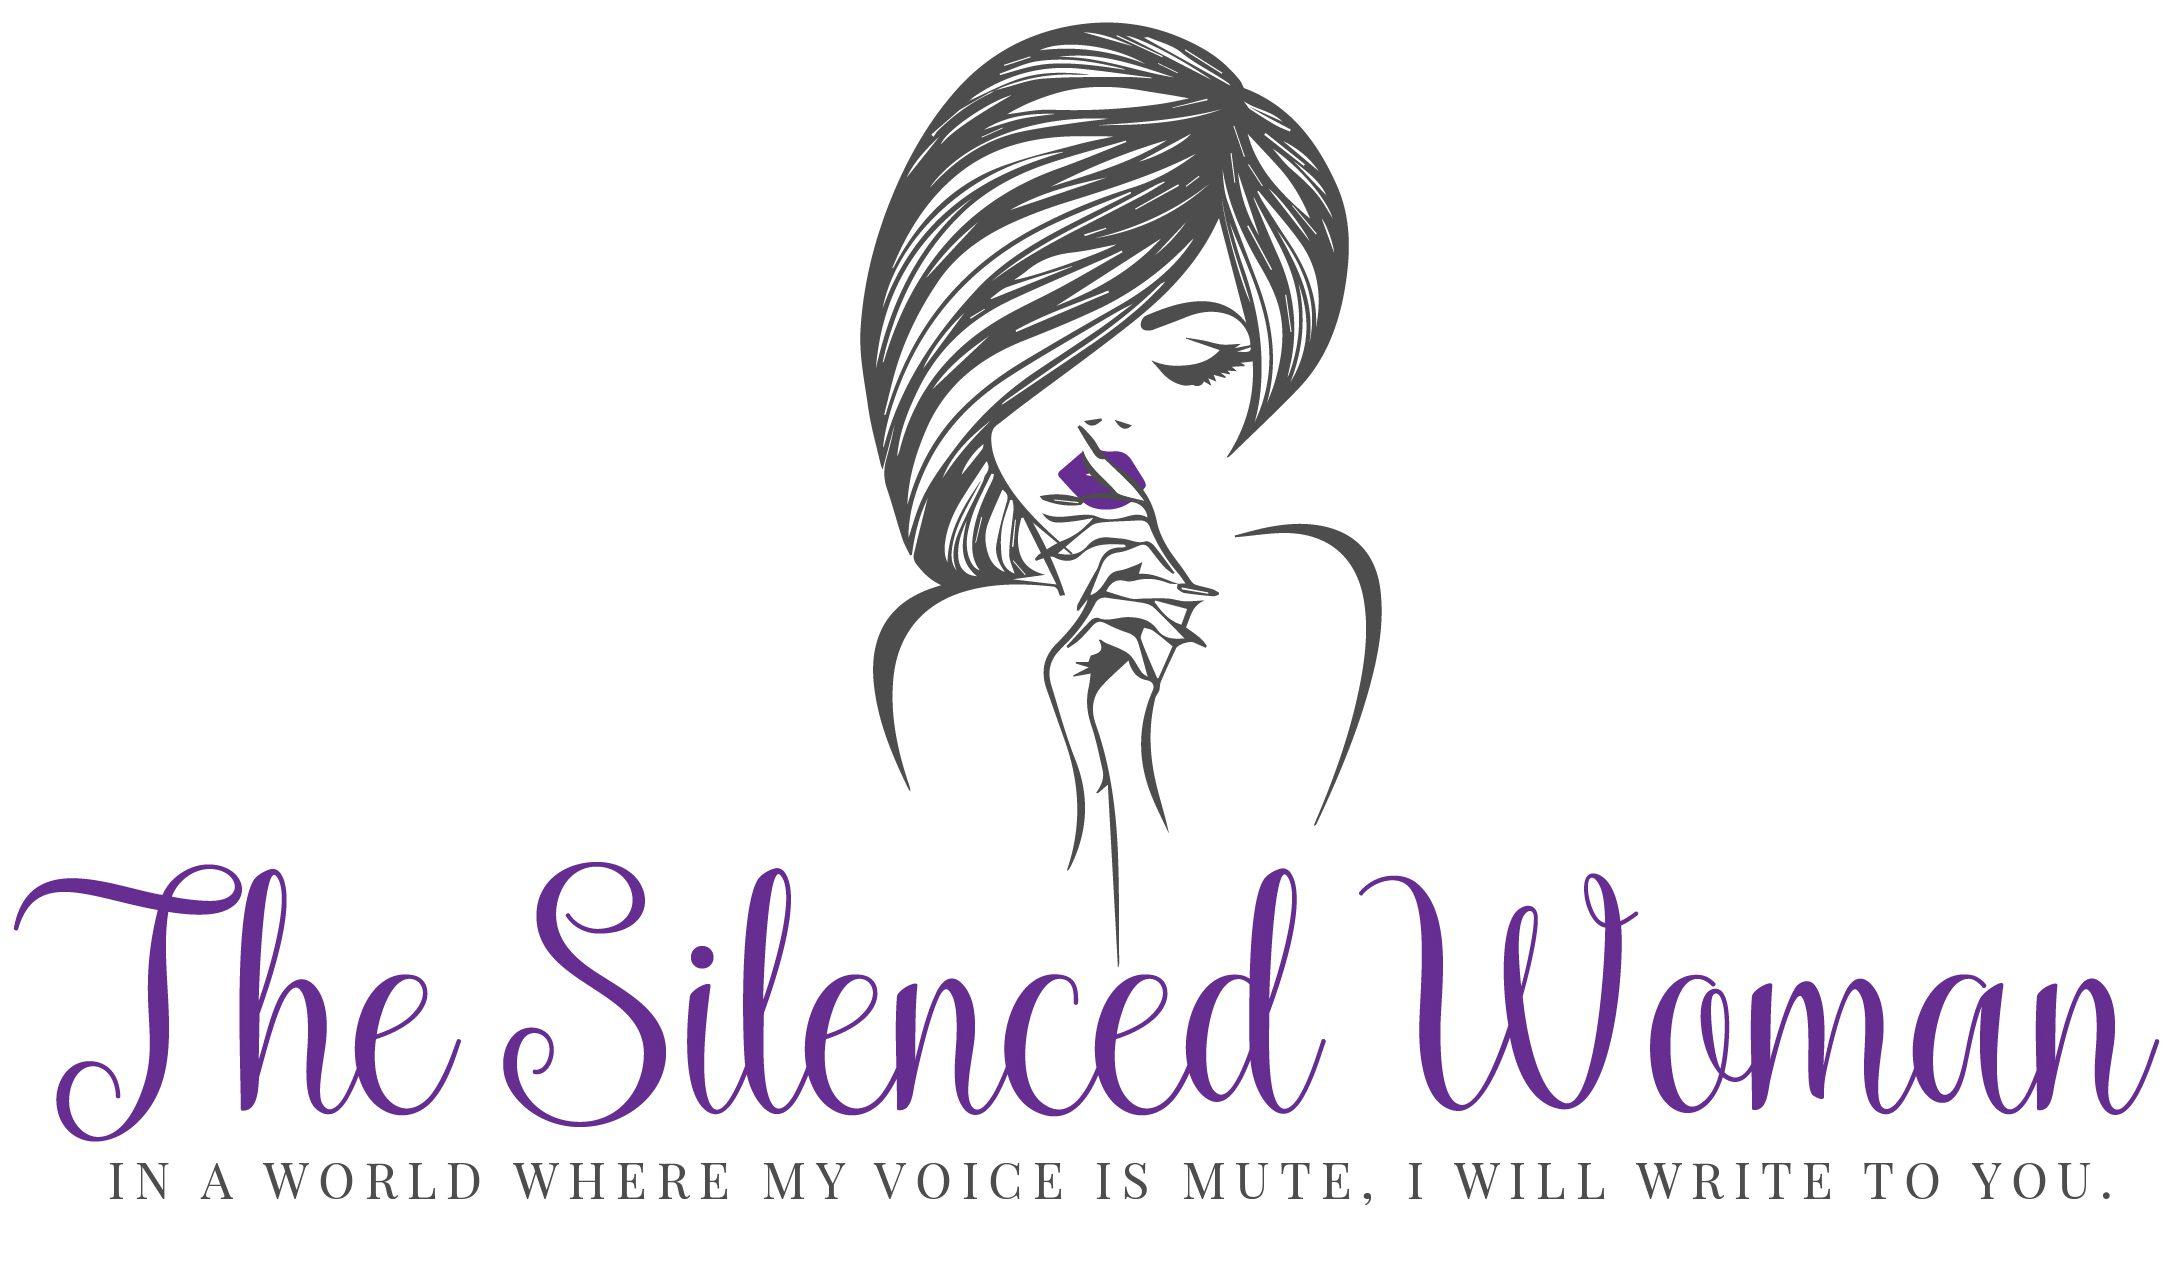 The Silenced Woman